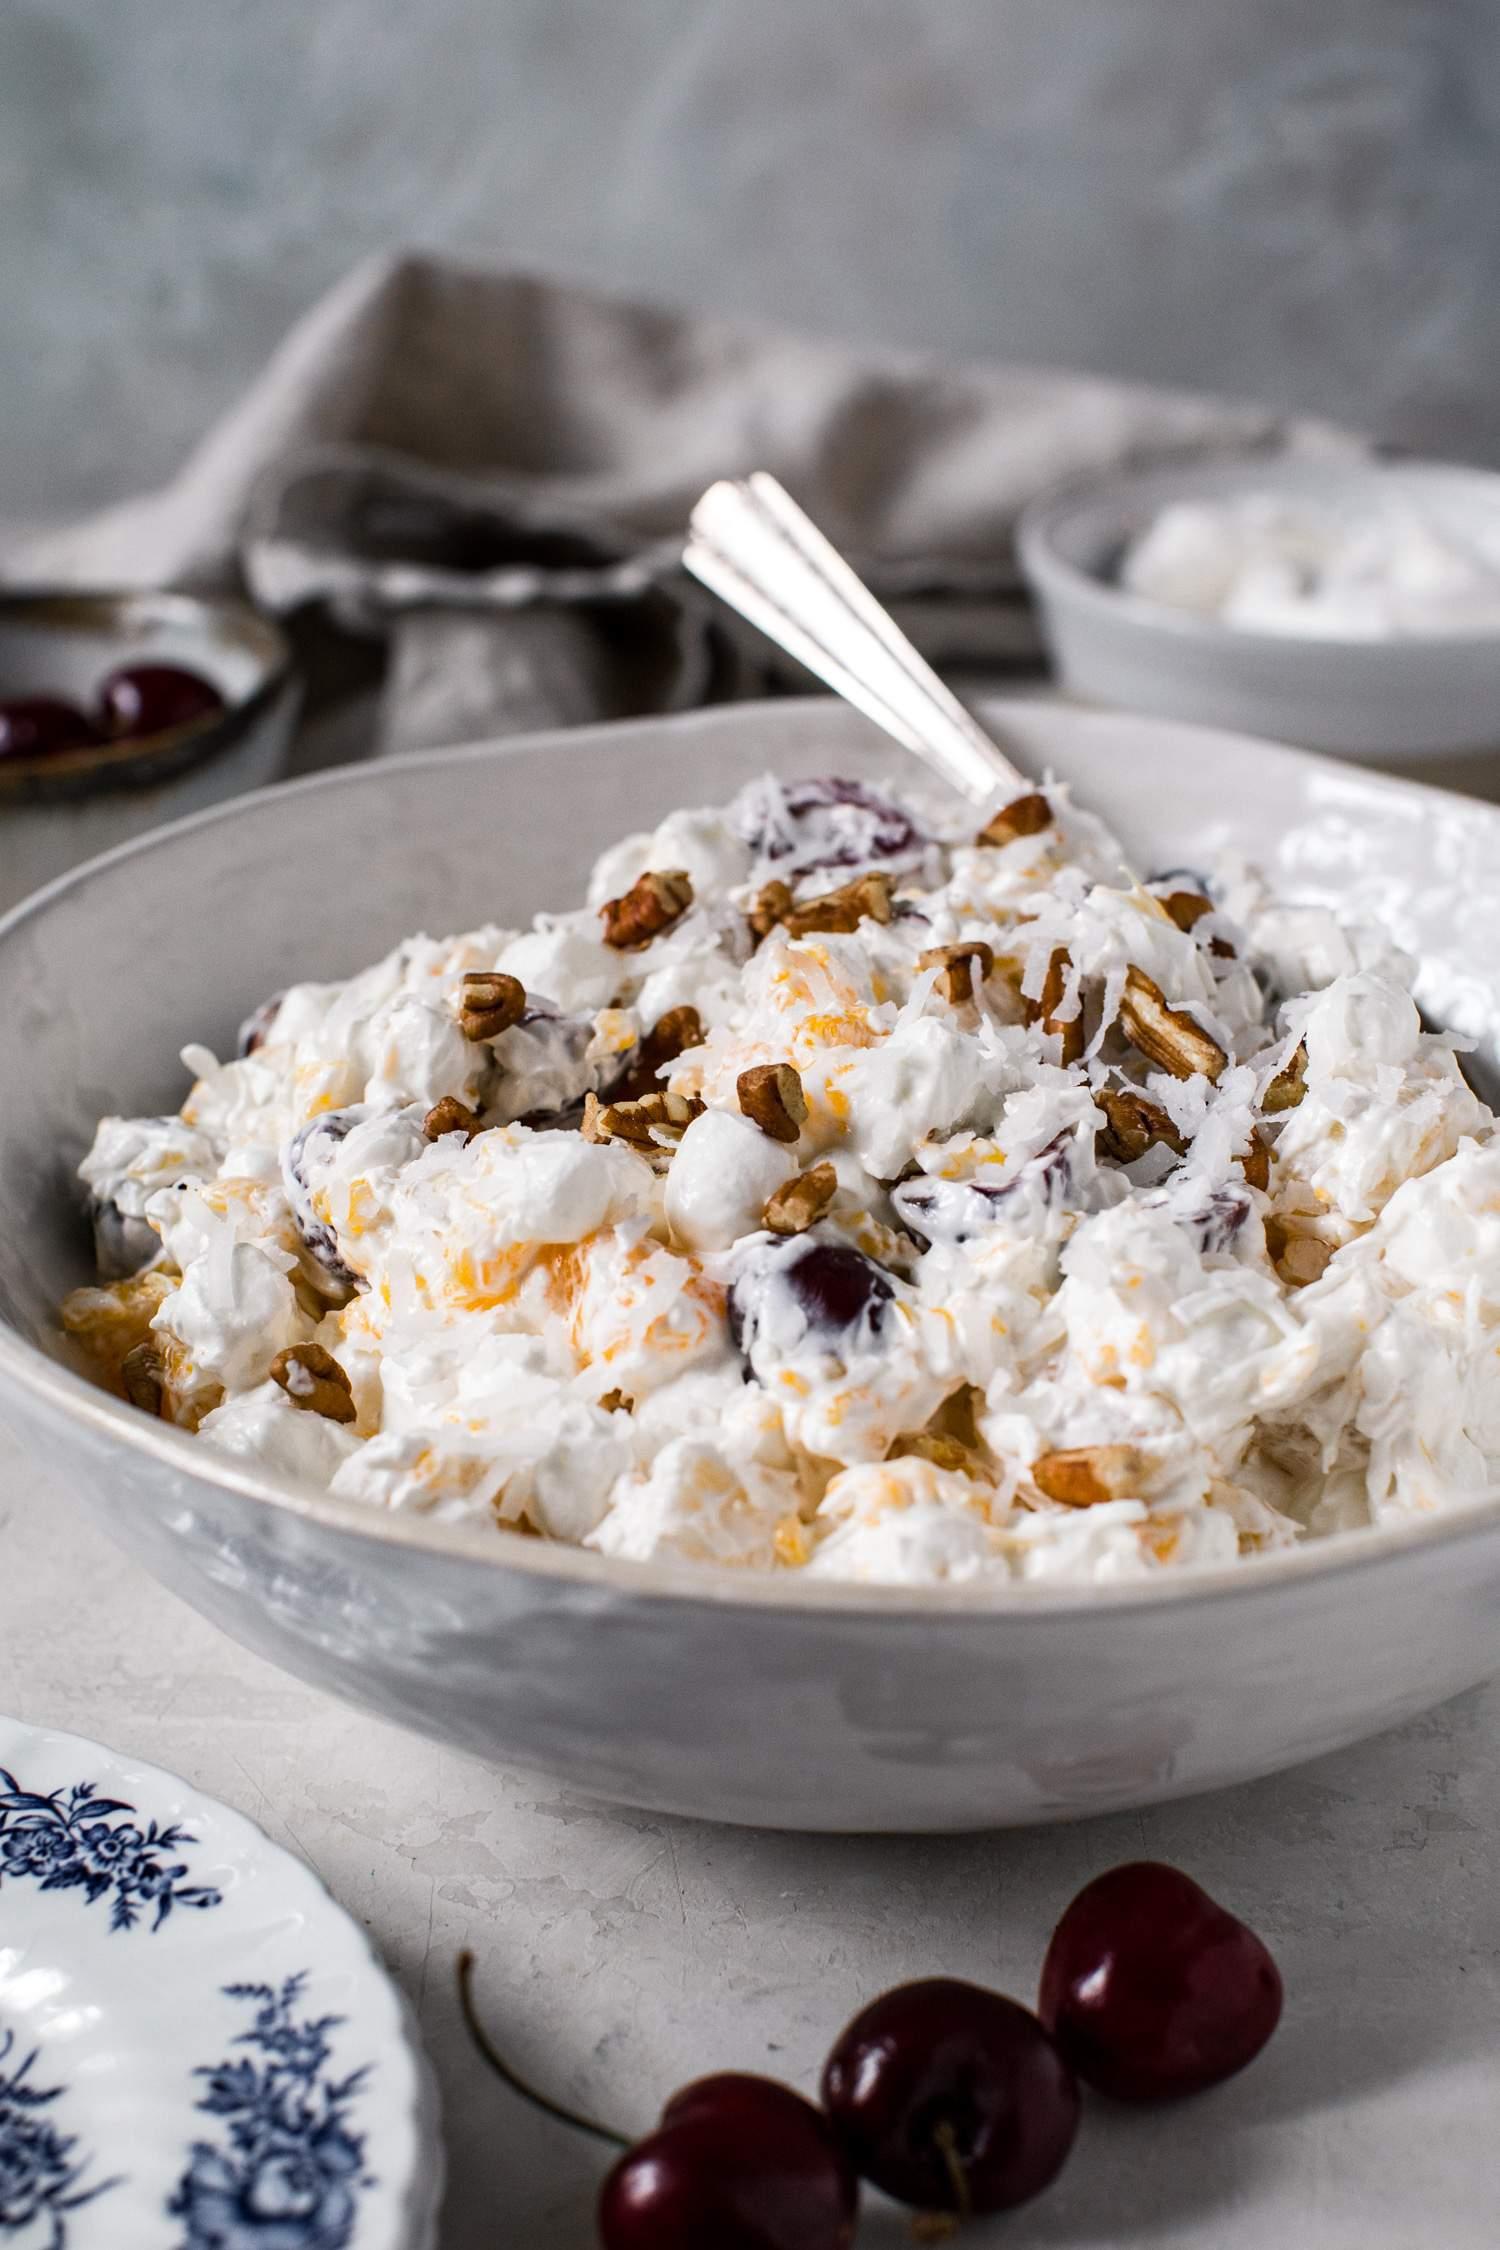 ambrosia in a white bowl